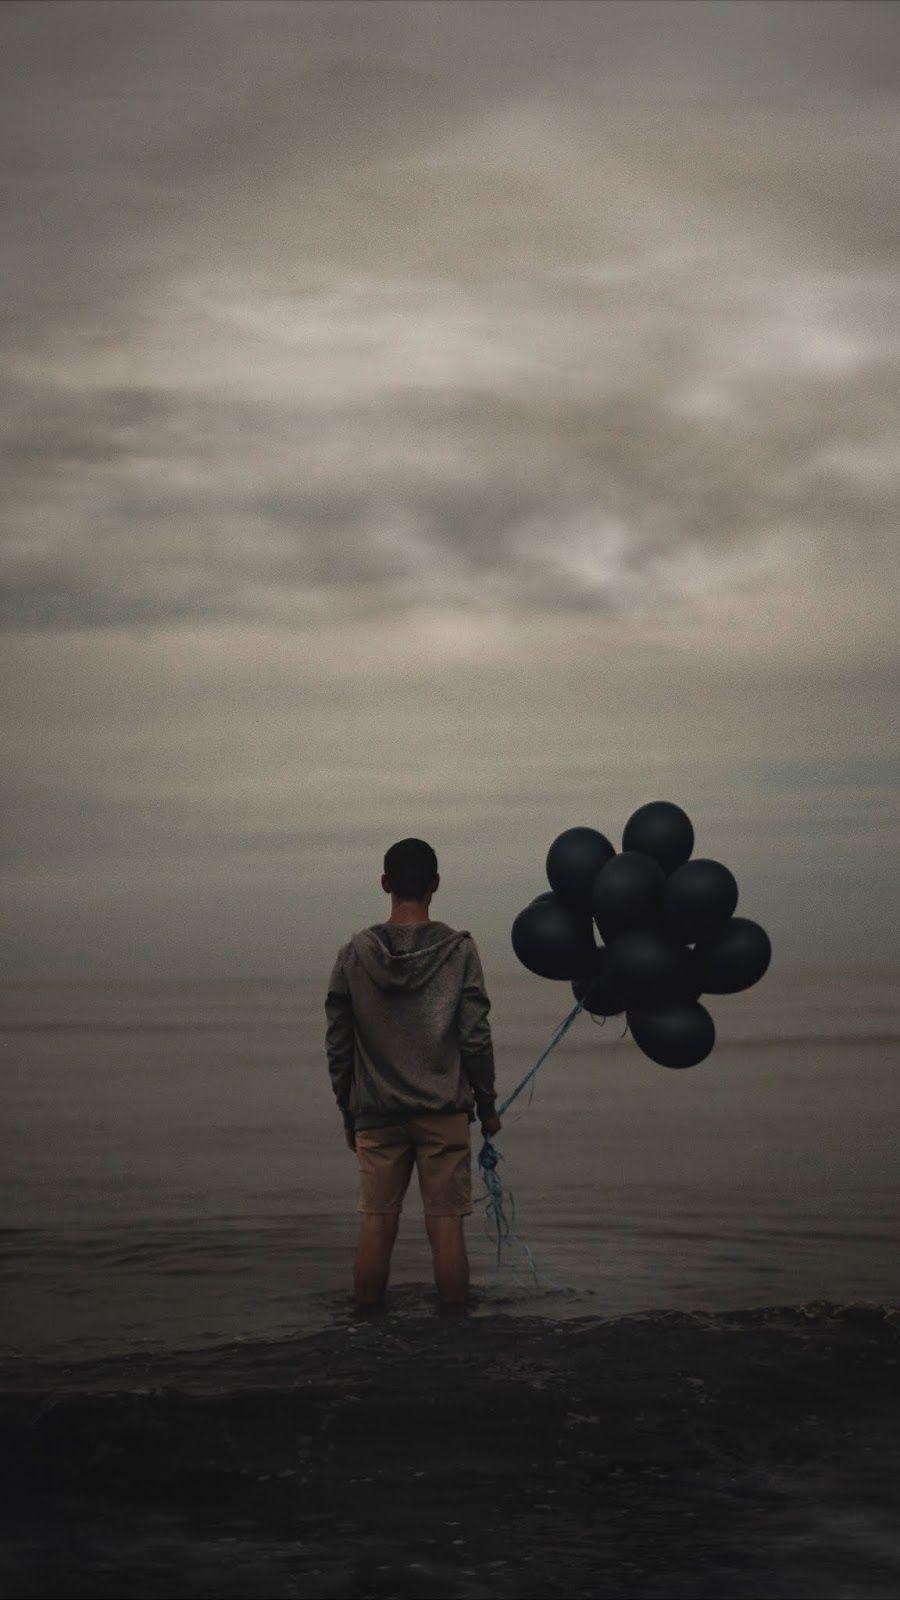 Sky Balloons, Black Sky id 46498 Love wallpaper